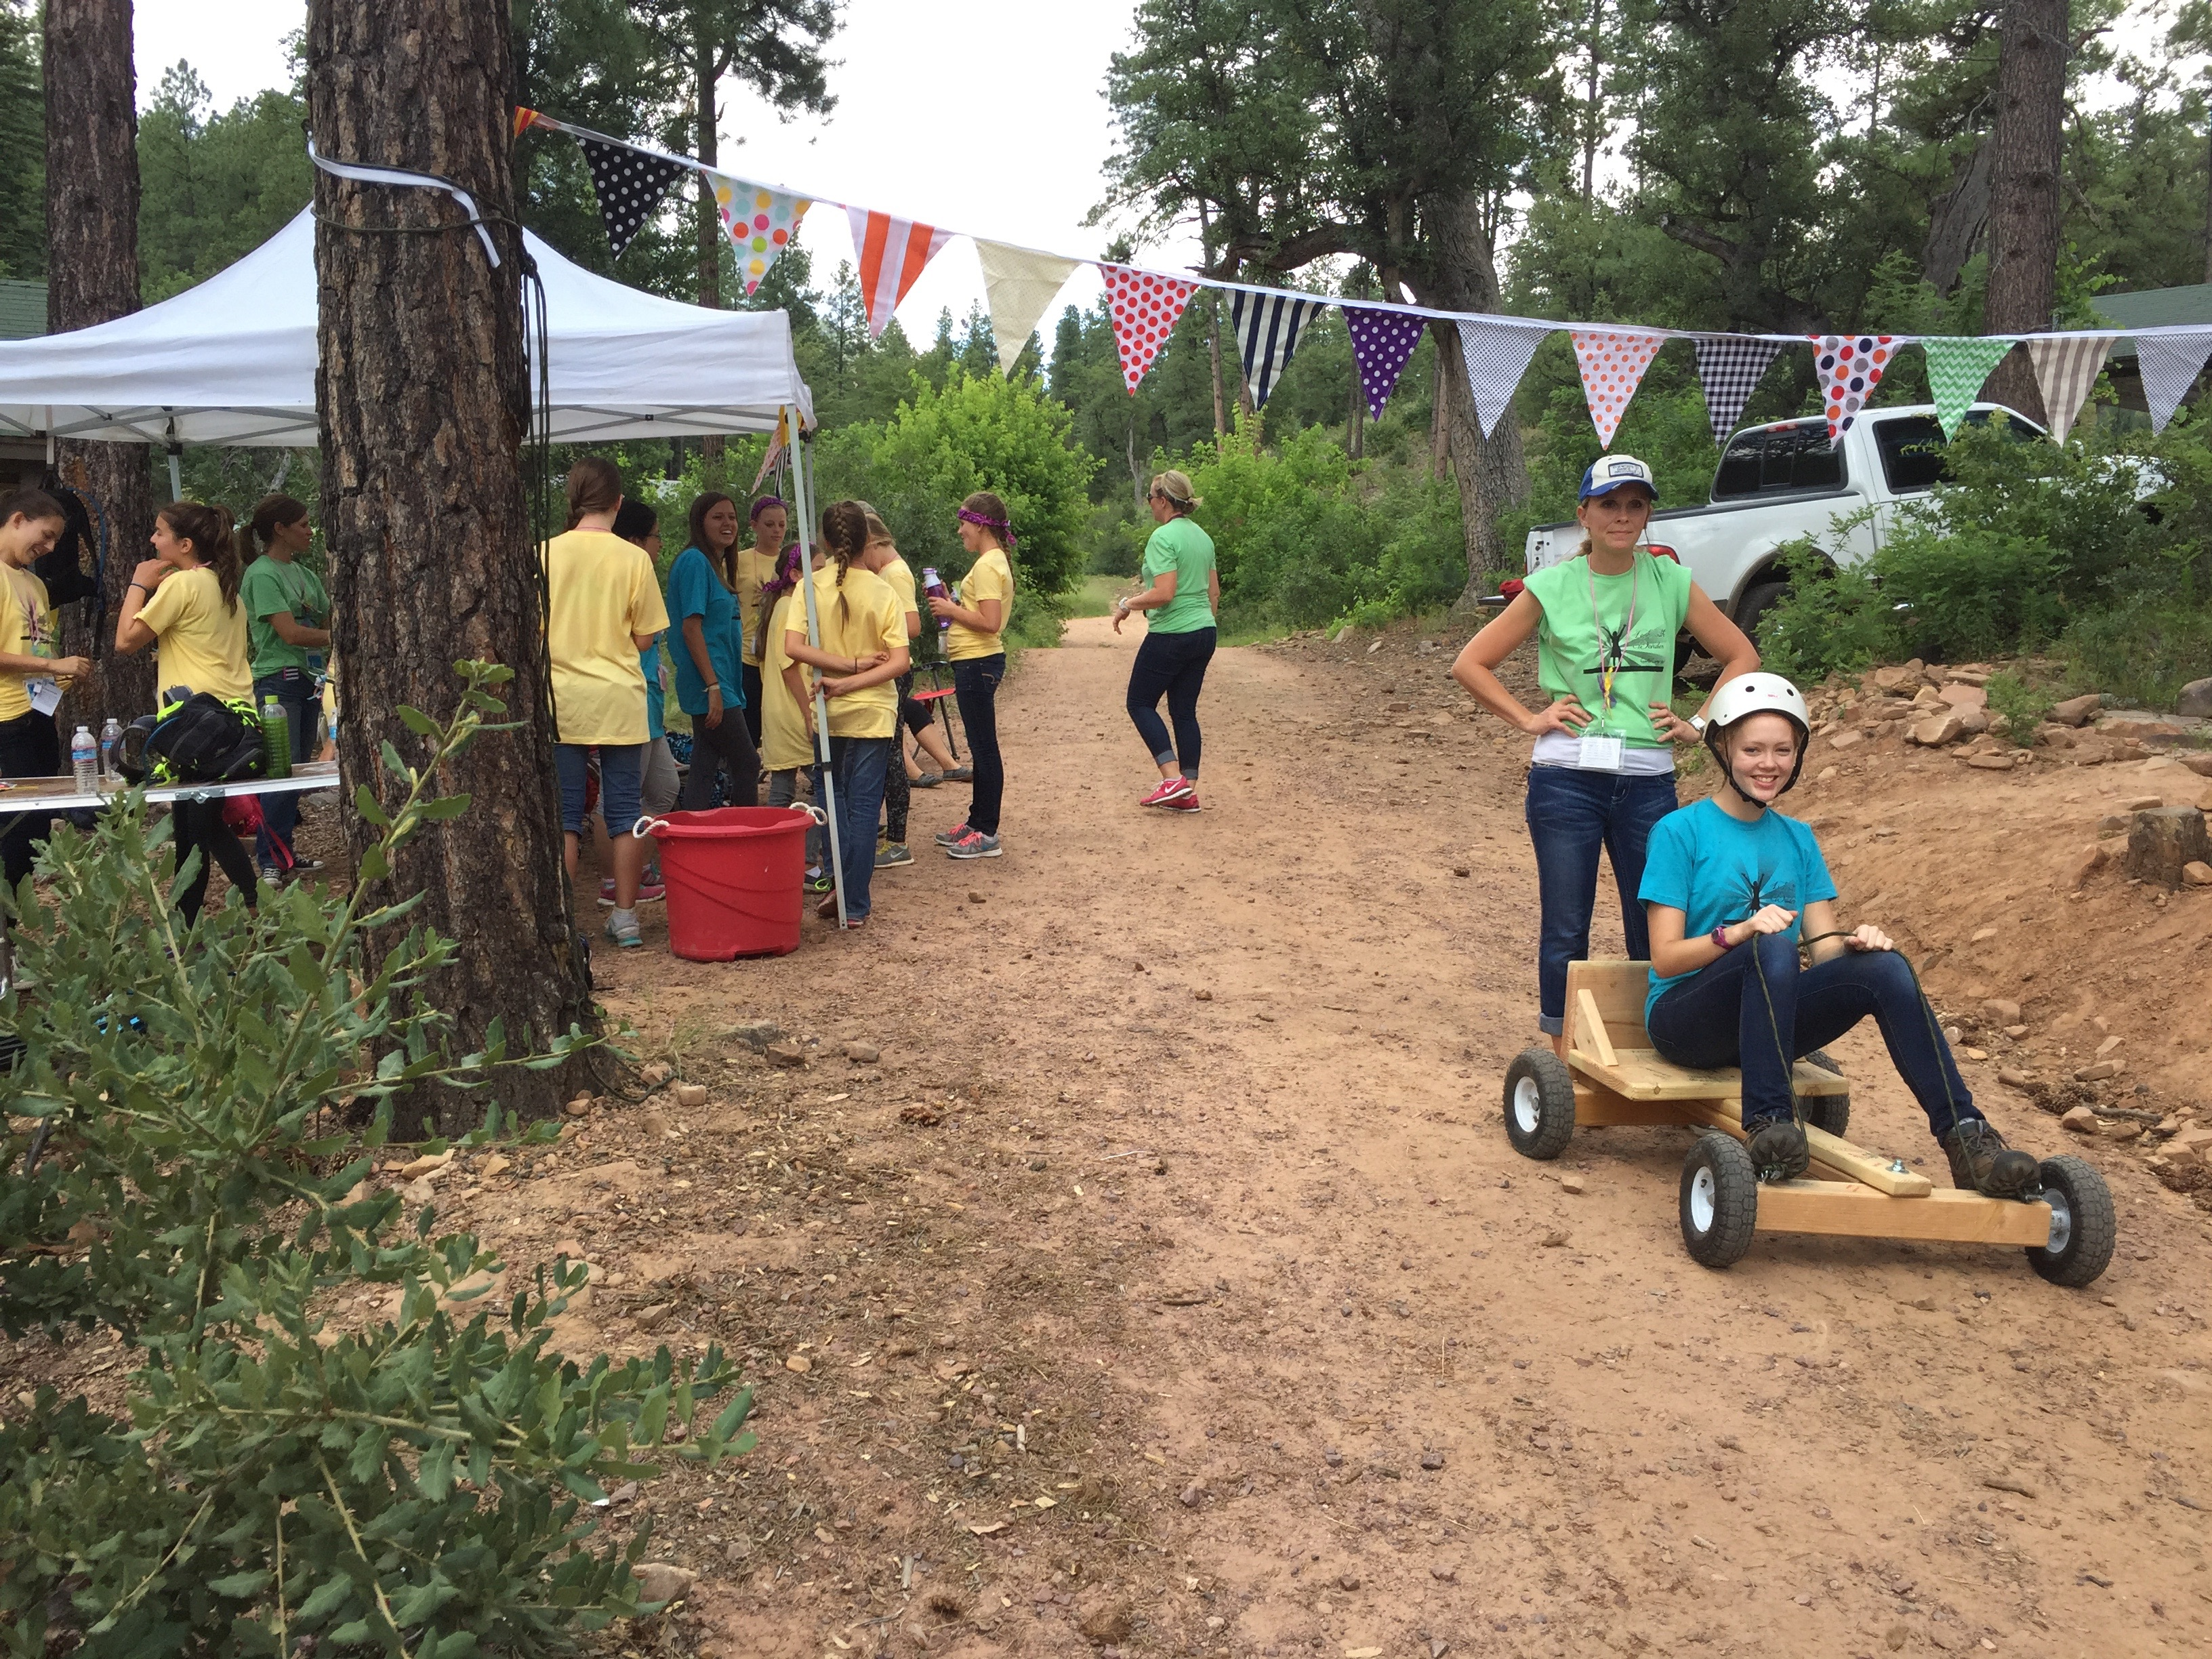 Gilbert Stake Girls Camp 2015 - A Happier Home